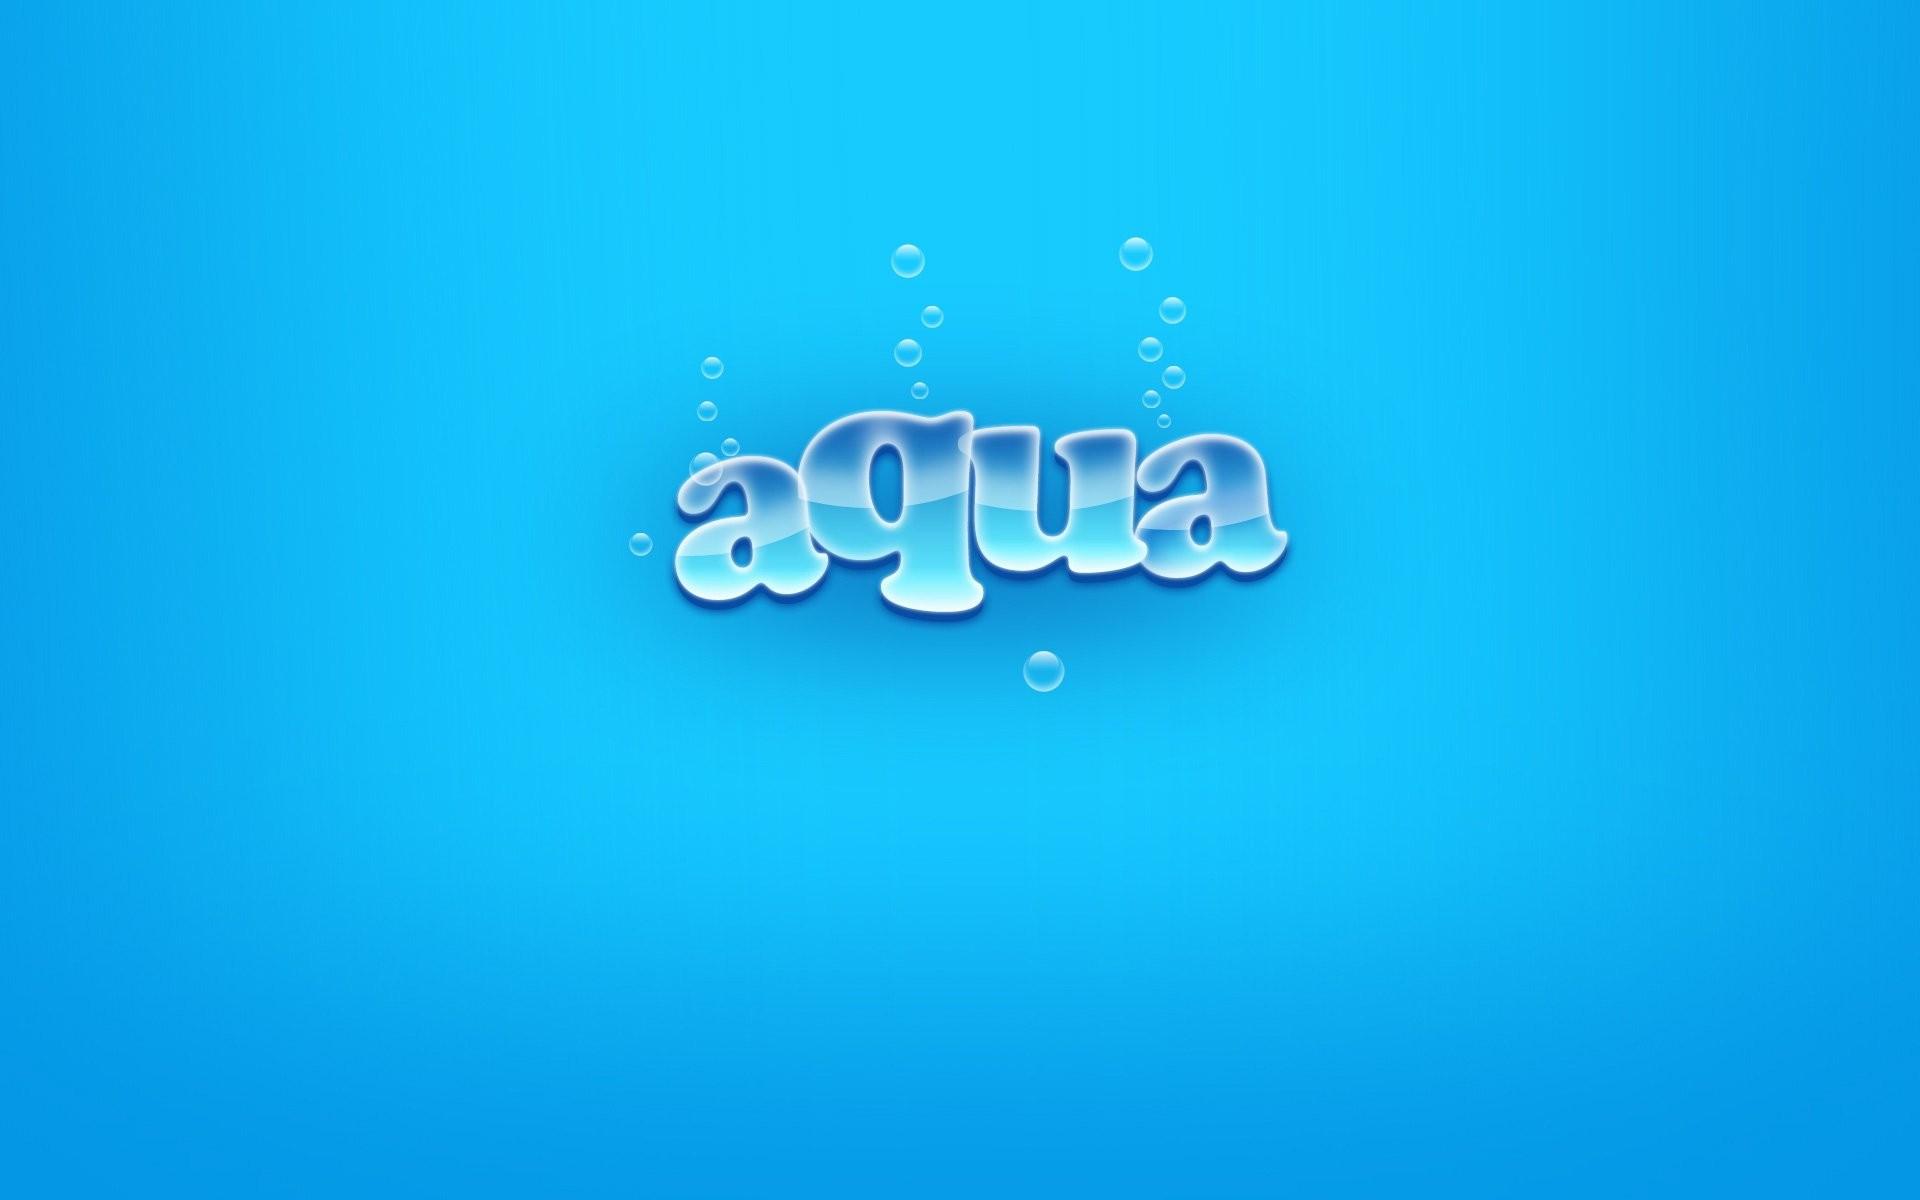 aqua background  u00b7 u2460 download free hd backgrounds for